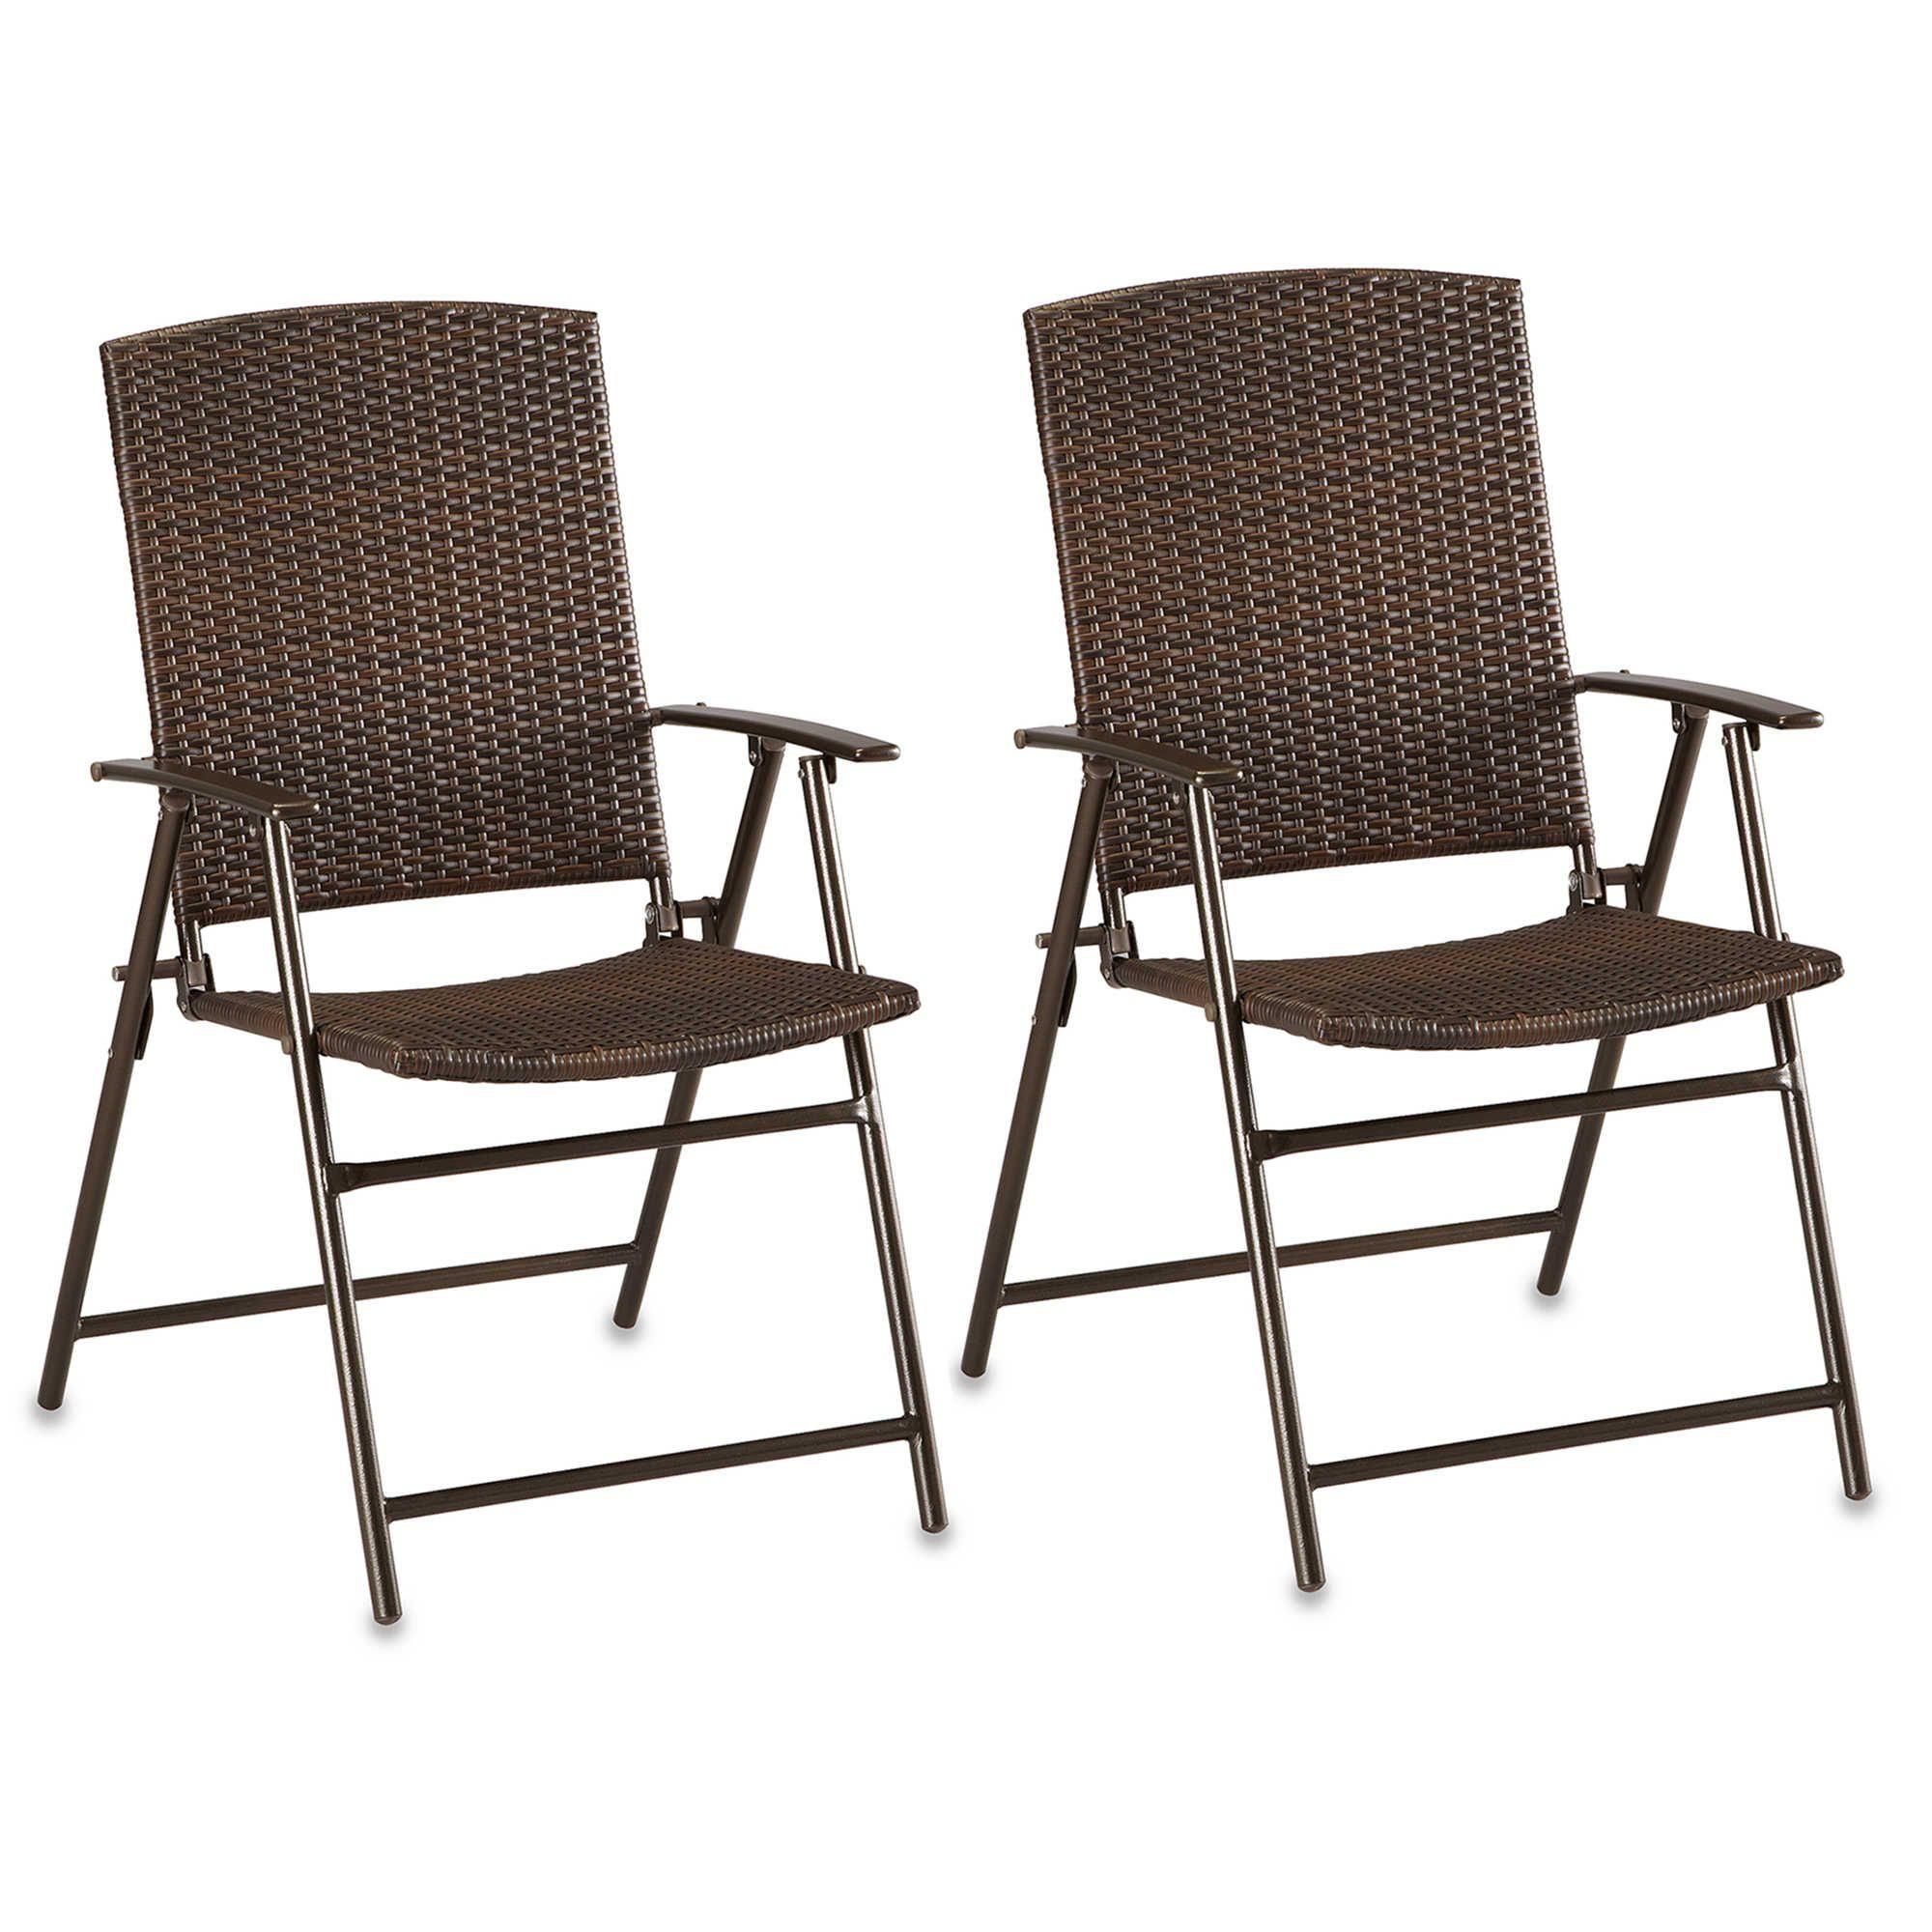 Inspirational Wicker Folding Chairs